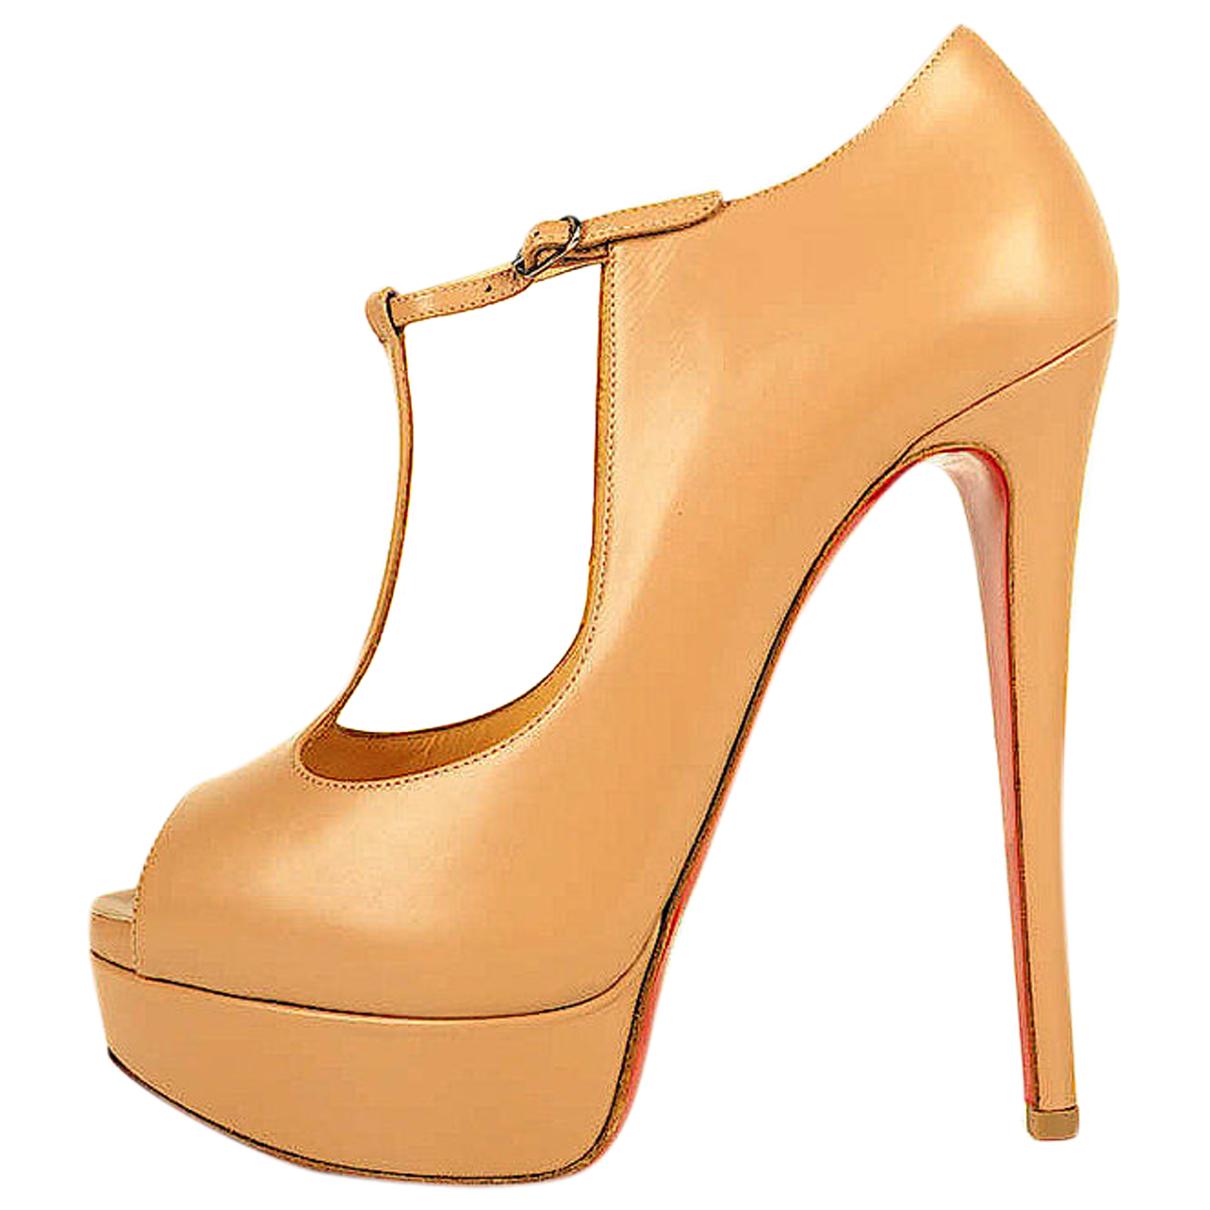 Christian Louboutin \N Beige Leather Heels for Women 40 EU